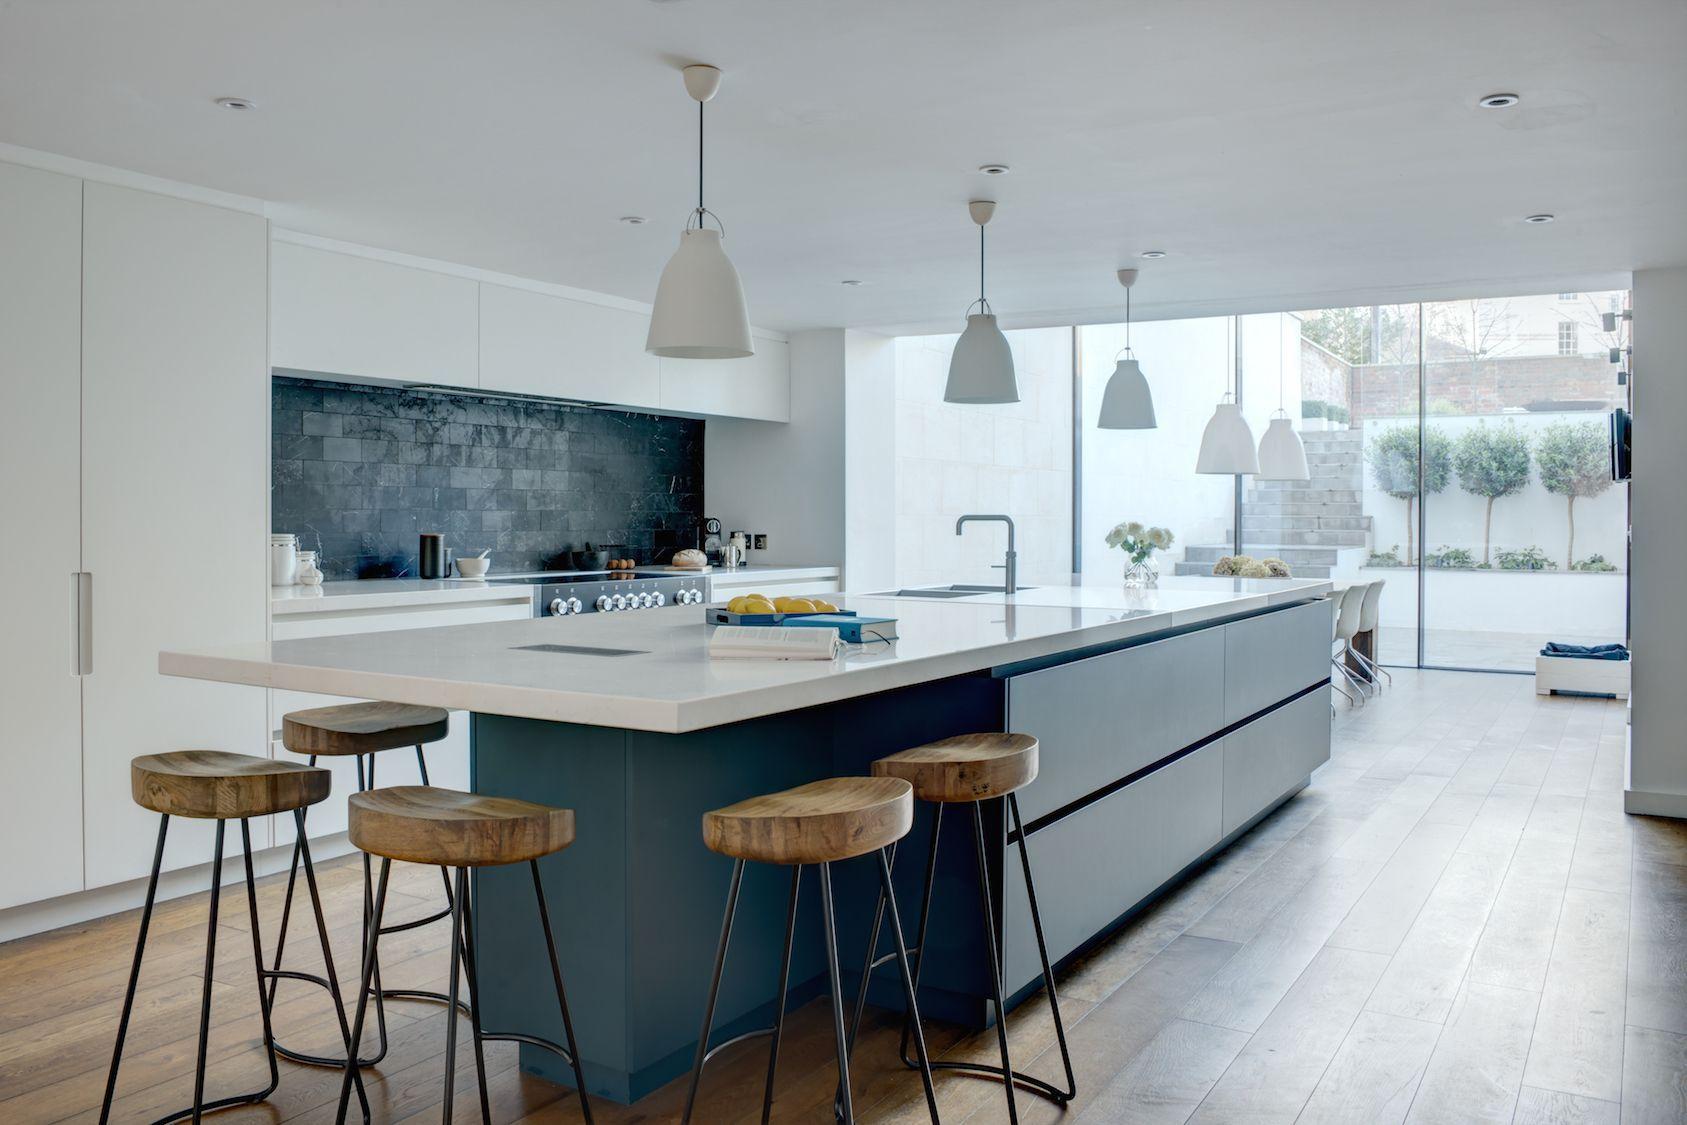 More Ideas Below Kitchenremodel Kitchenideas Rustic Large Kitchen Layout Design Farmh Kitchen Island With Seating Modern Kitchen Design Contemporary Kitchen